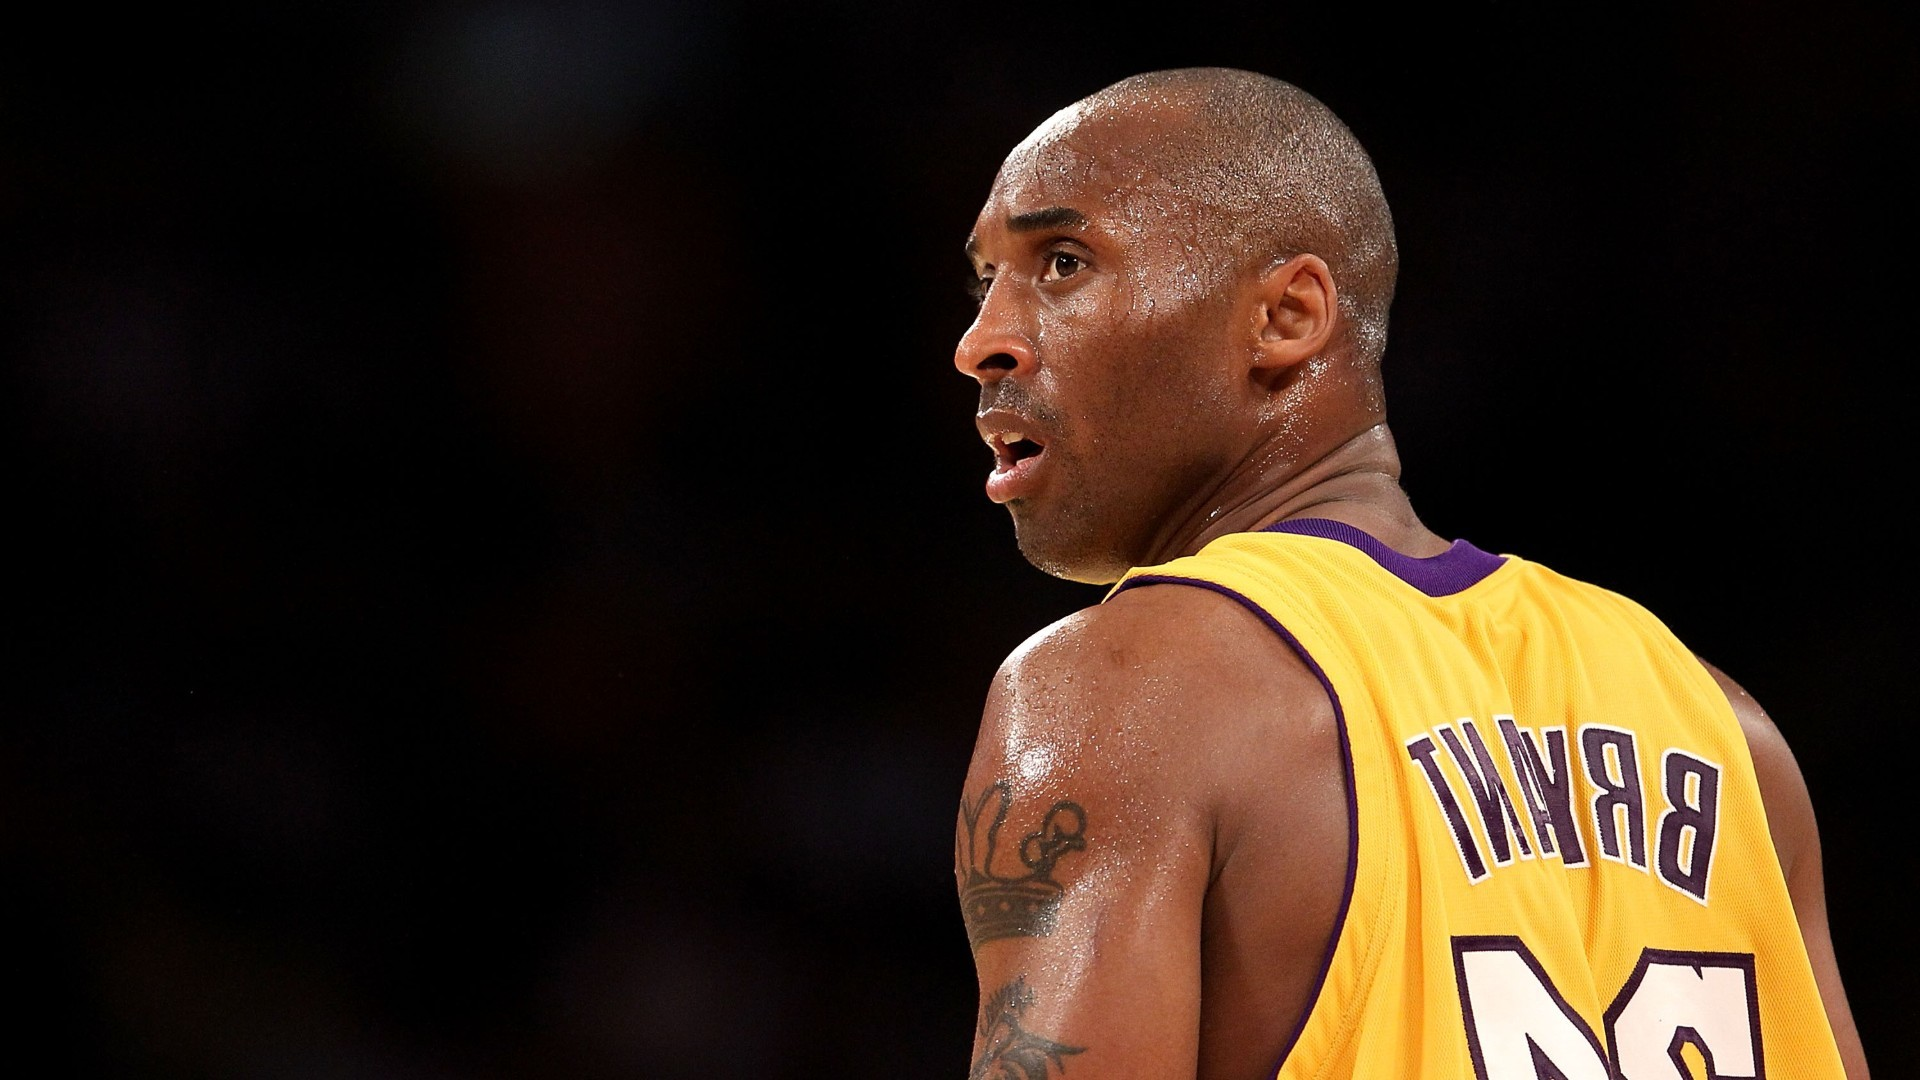 US basketball superstar Kobe Bryant killed in helicopter crash